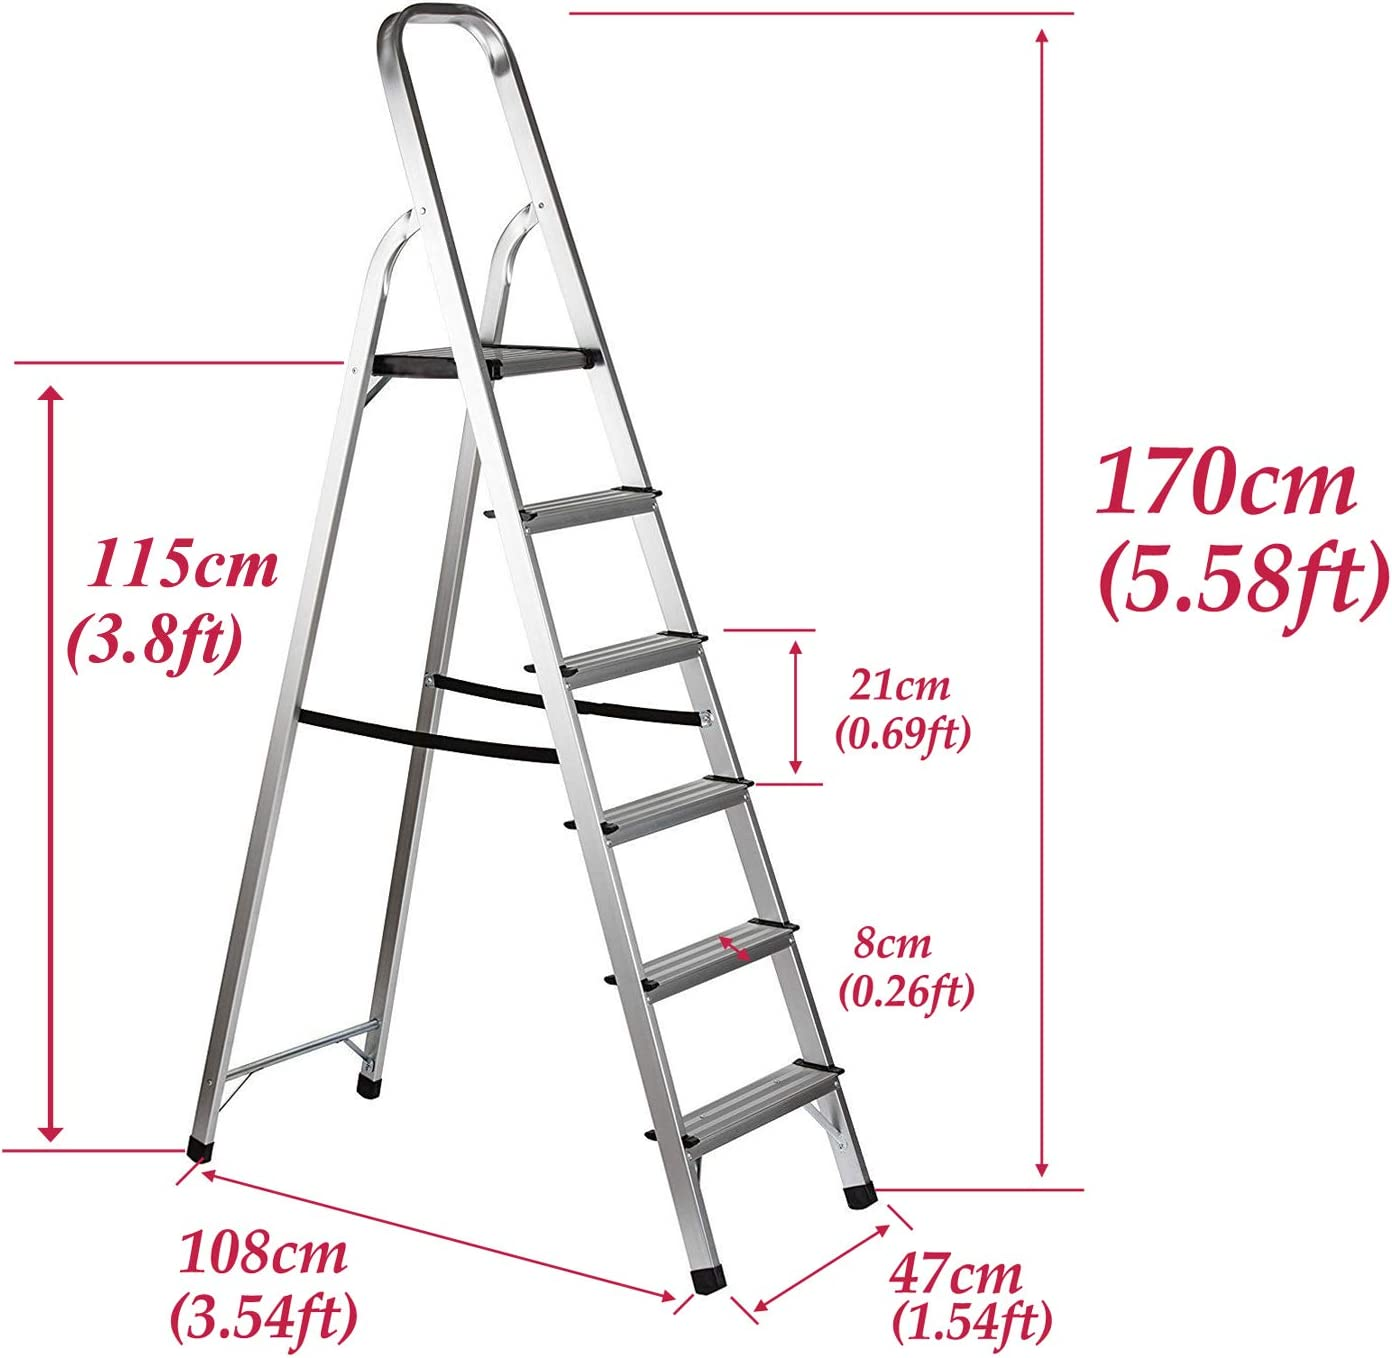 Stepladders 7 Step Foldable Aluminium Lightweight Portable Ladder Stool Max Load 152kg Anti-Slip Rubber Feet